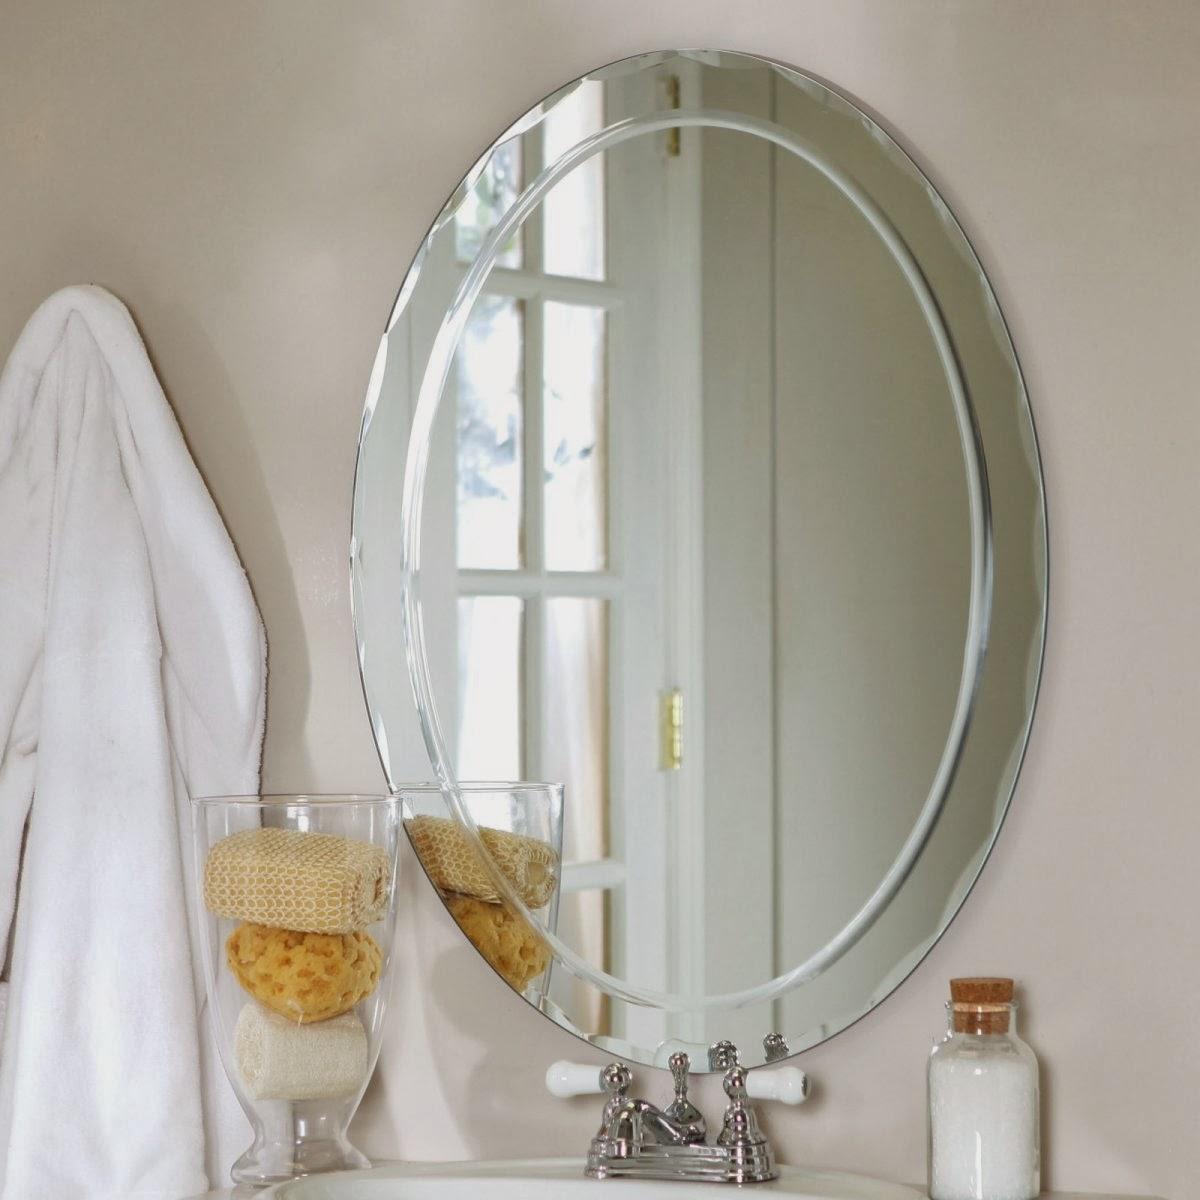 Round Bathroom White Framed Bathroom Mirrors 36 Quot X 36 Quot Framed M Bathroom